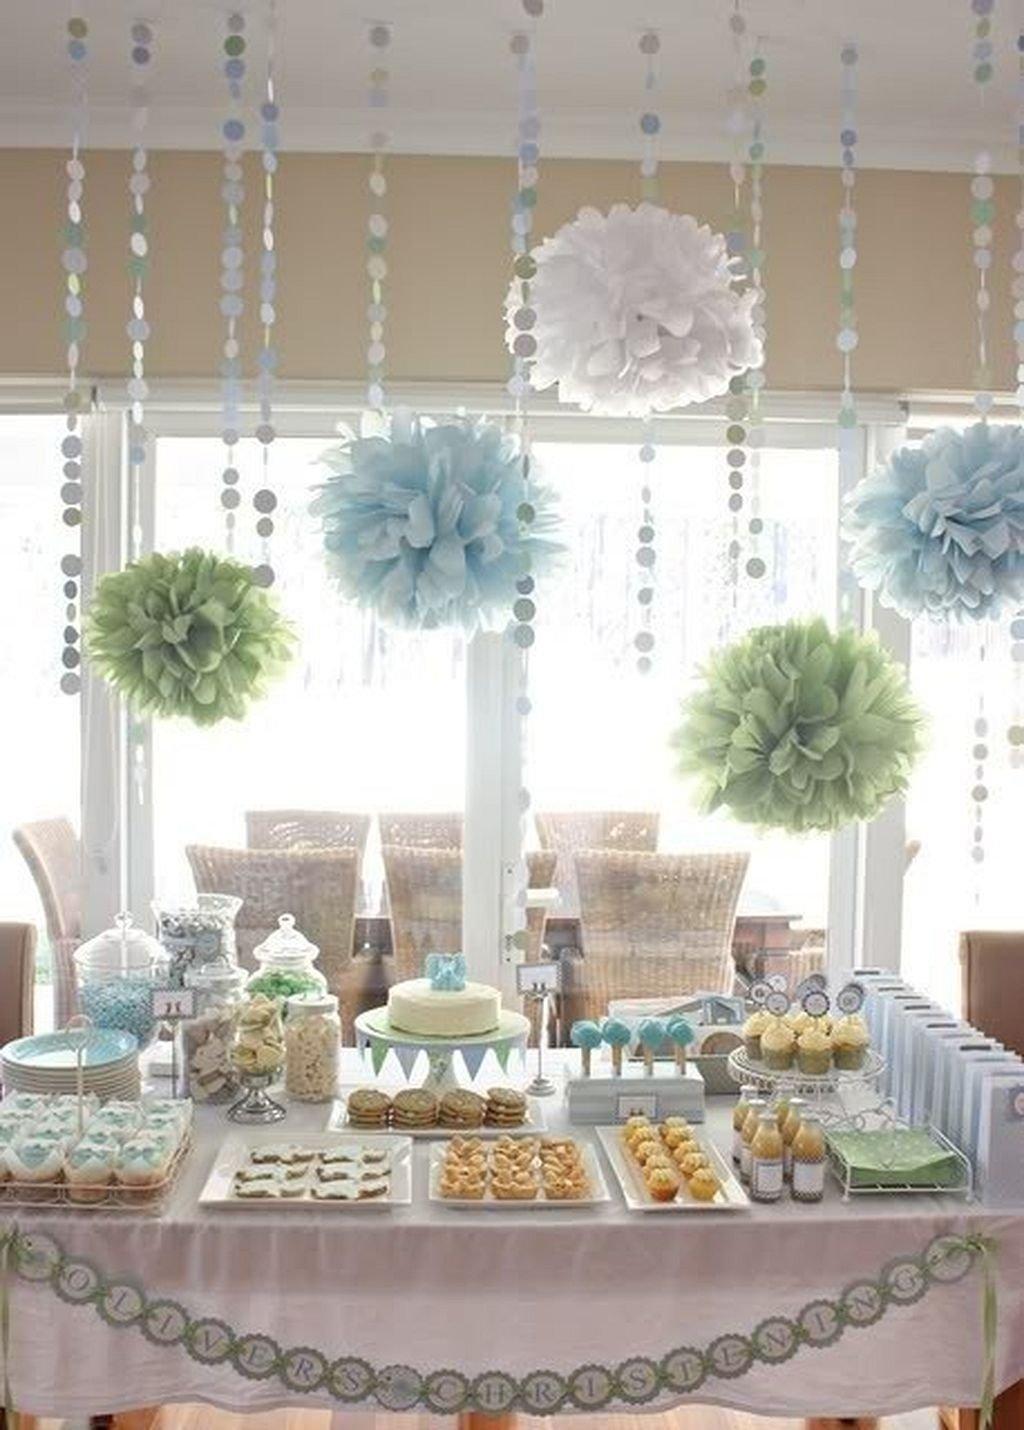 10 Stunning Decorating Ideas For Bridal Shower 20 bridal shower ideas bridal showers bridal showers and weddings